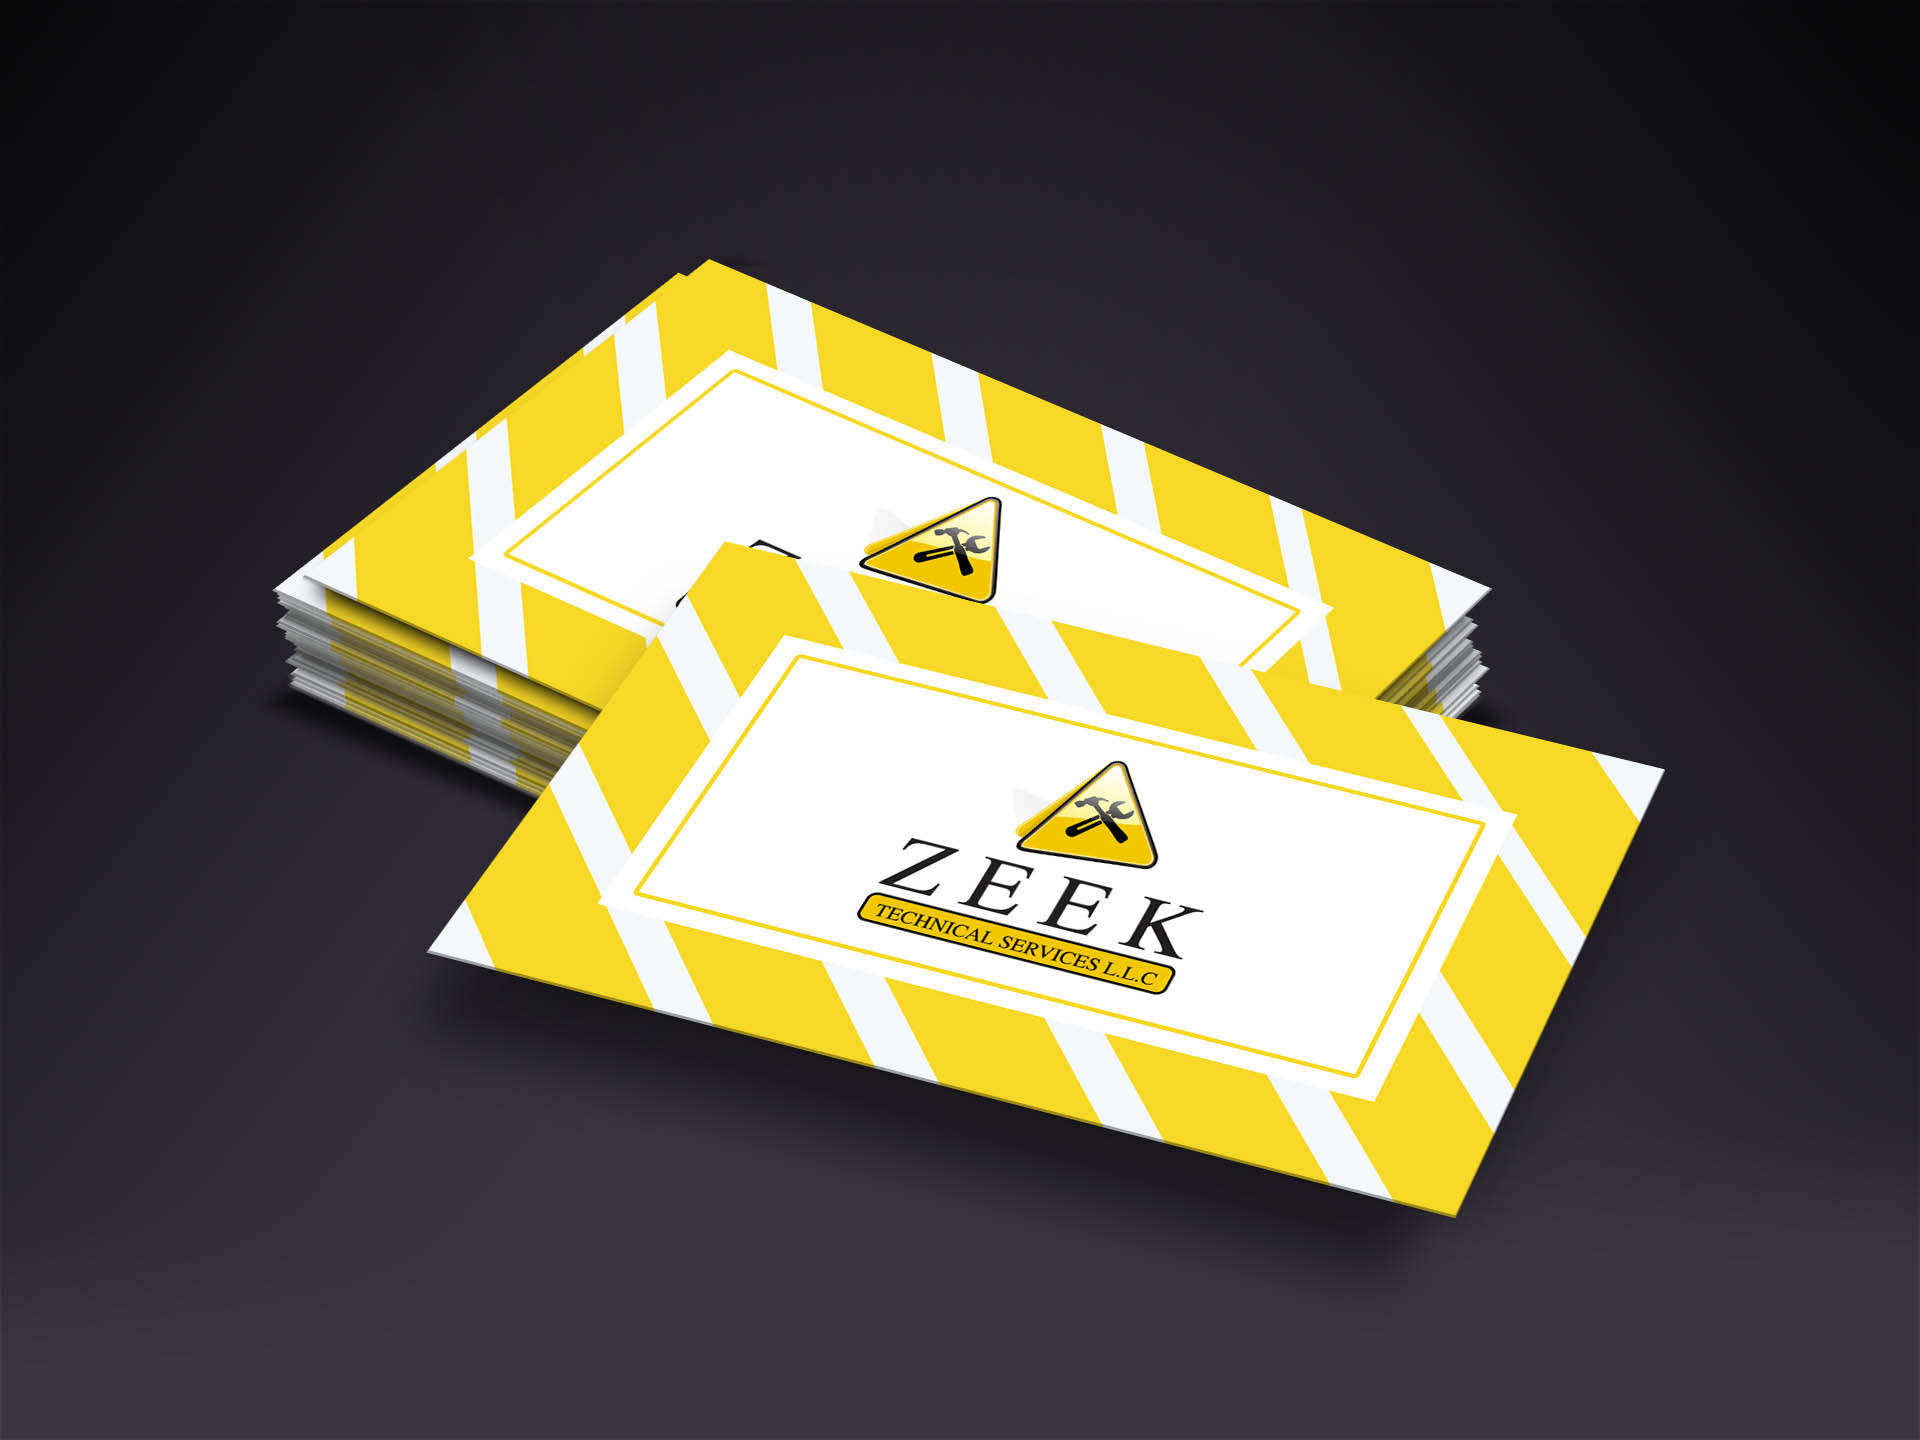 logo design zeek